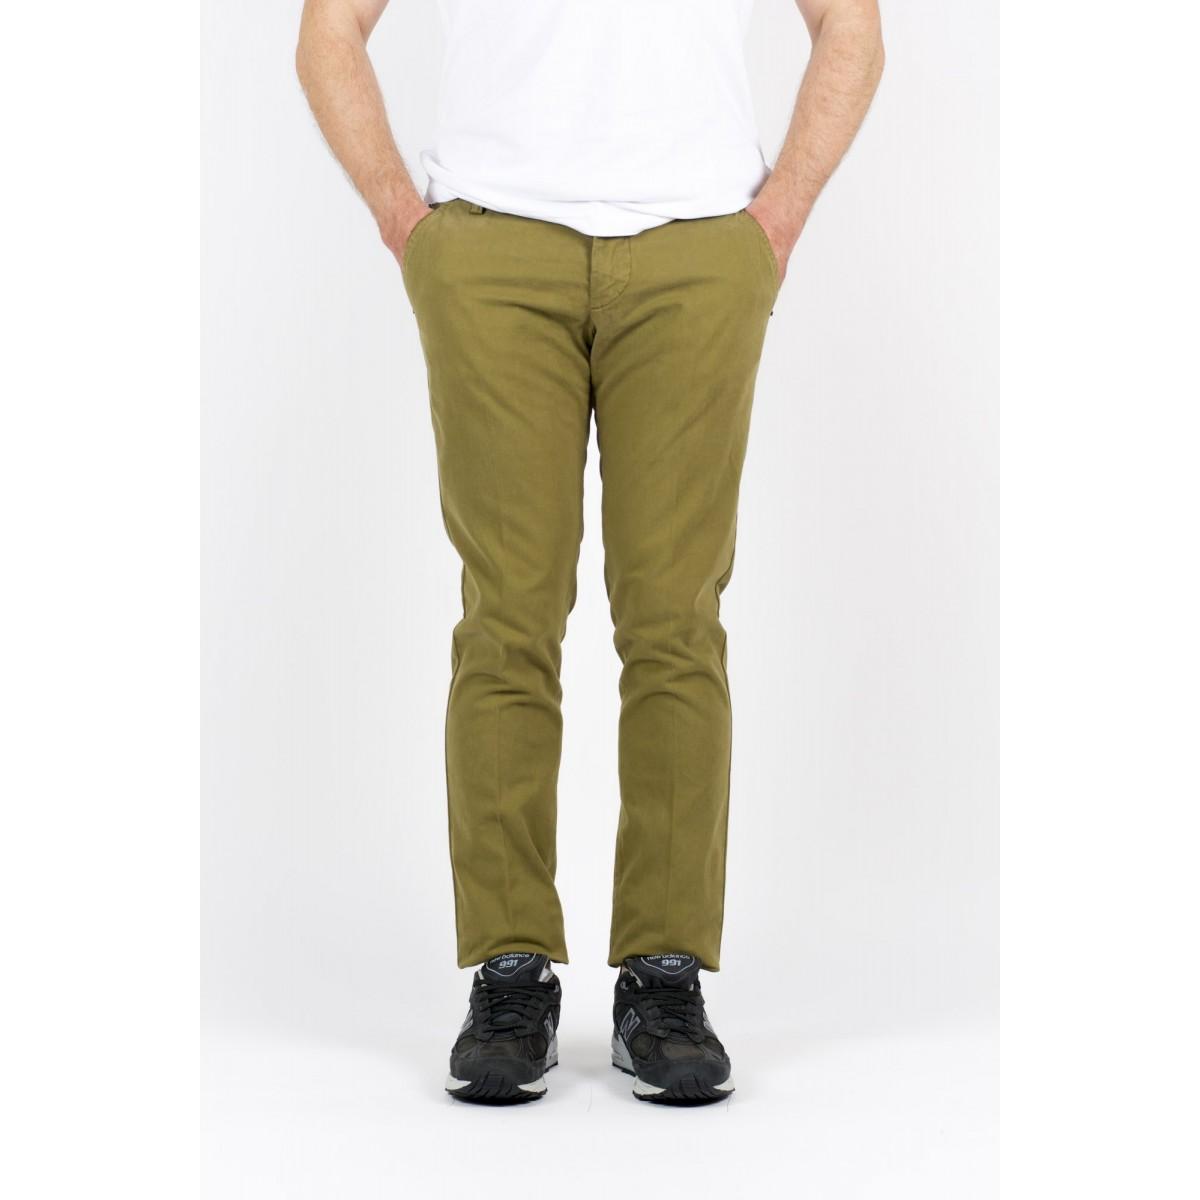 Pantalone uomo Entre amis - Pantalone tasca america slim con fondo 16cm 903 - Oliva